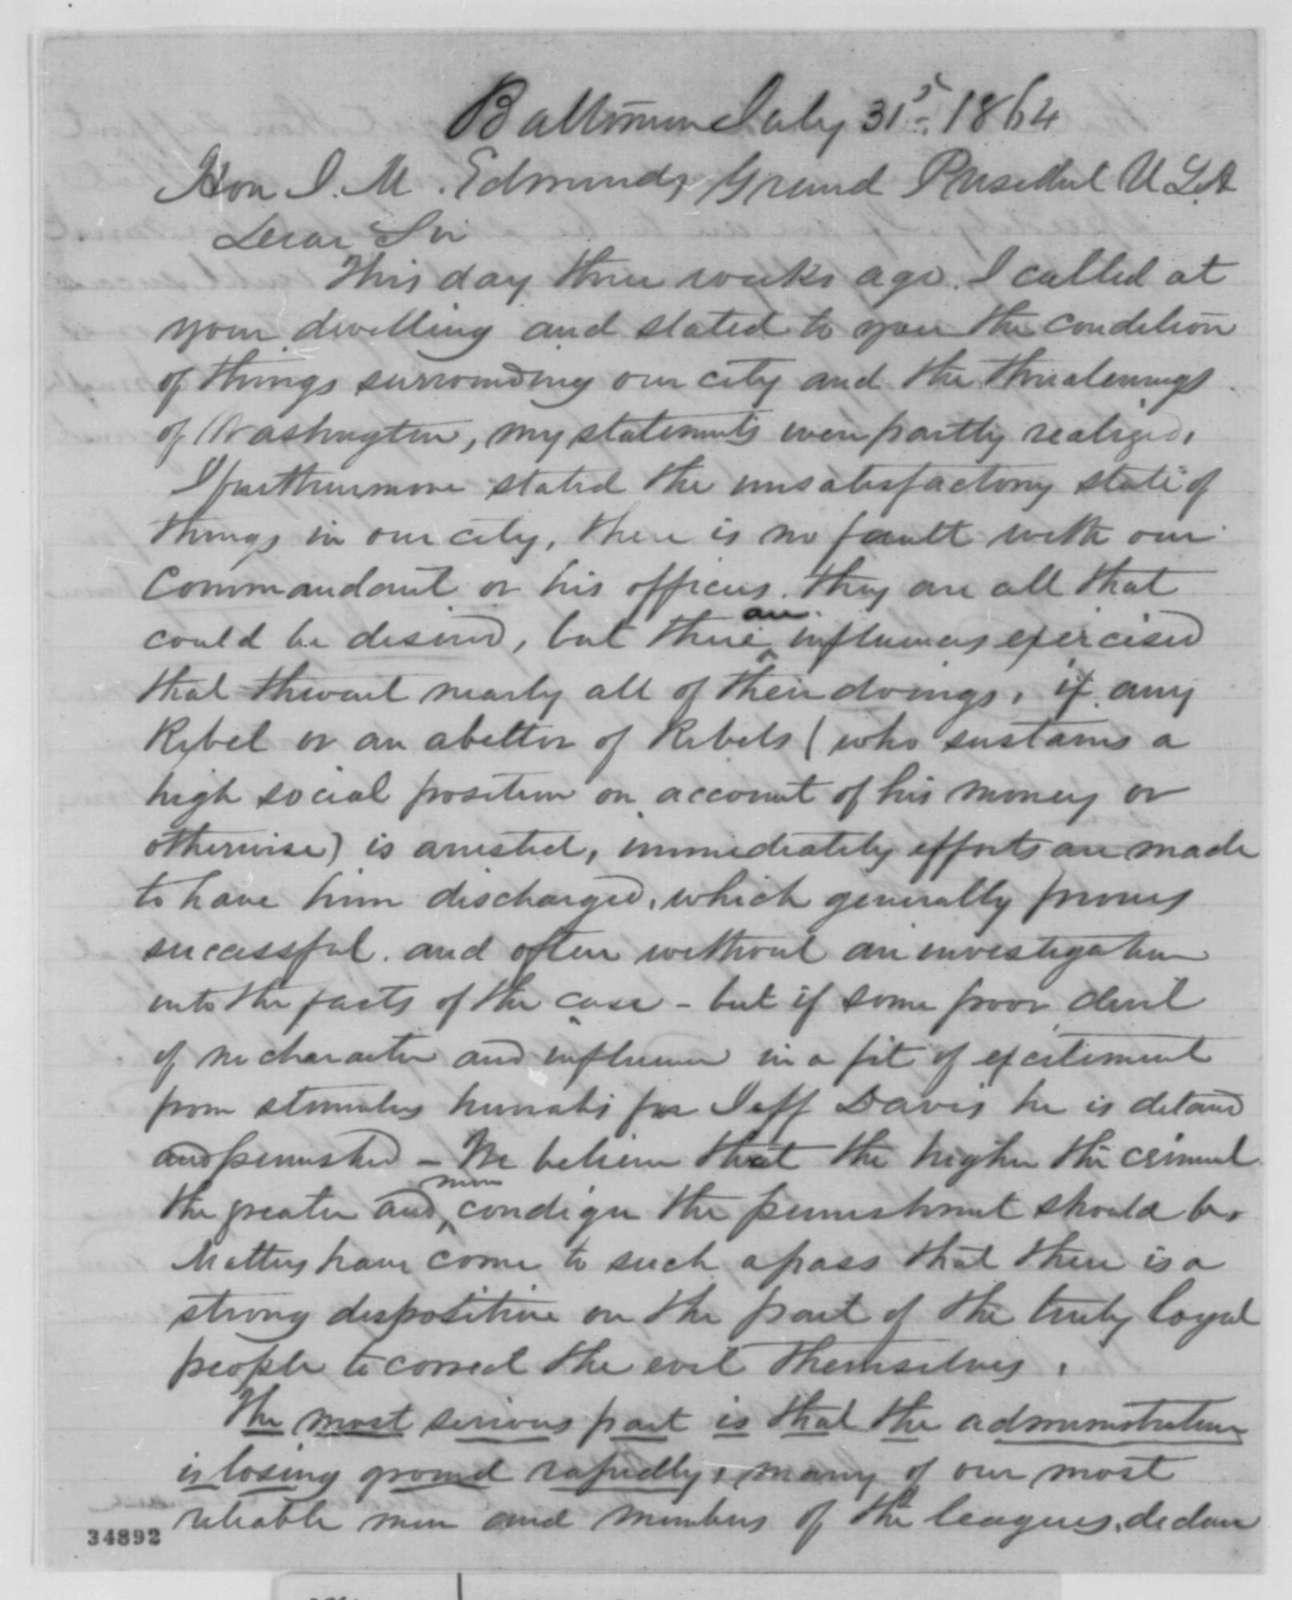 James Armitage to James M. Edmunds, Sunday, July 31, 1864  (Political affairs)